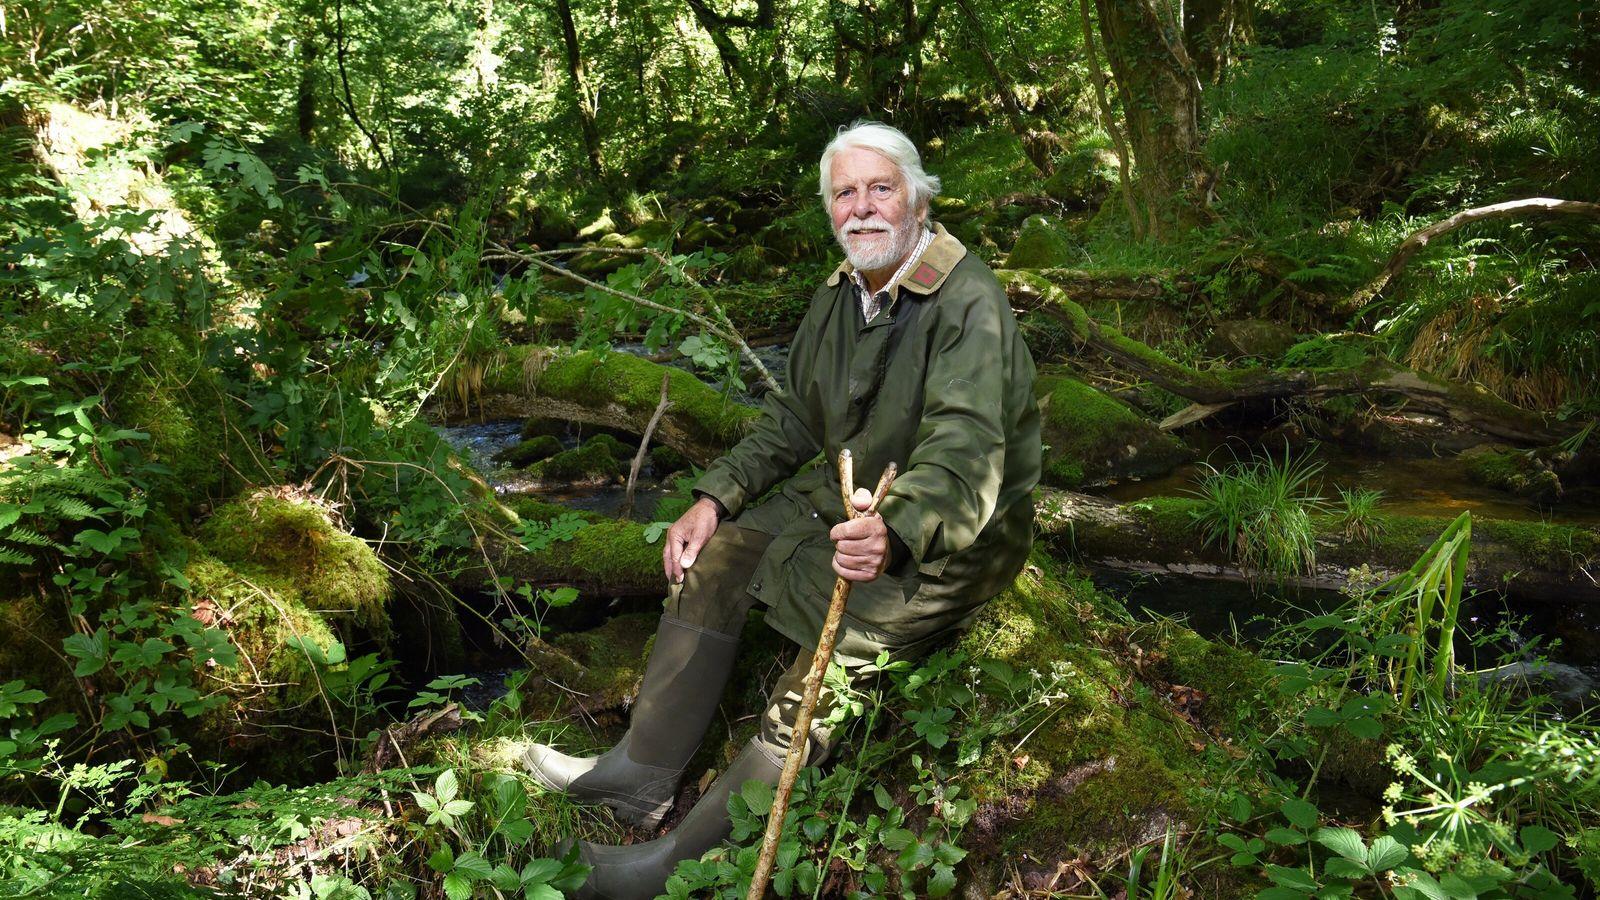 Meet the adventurer: veteran explorer Robin Hanbury-Tenison on surviving Covid-19 and taking on new challenges